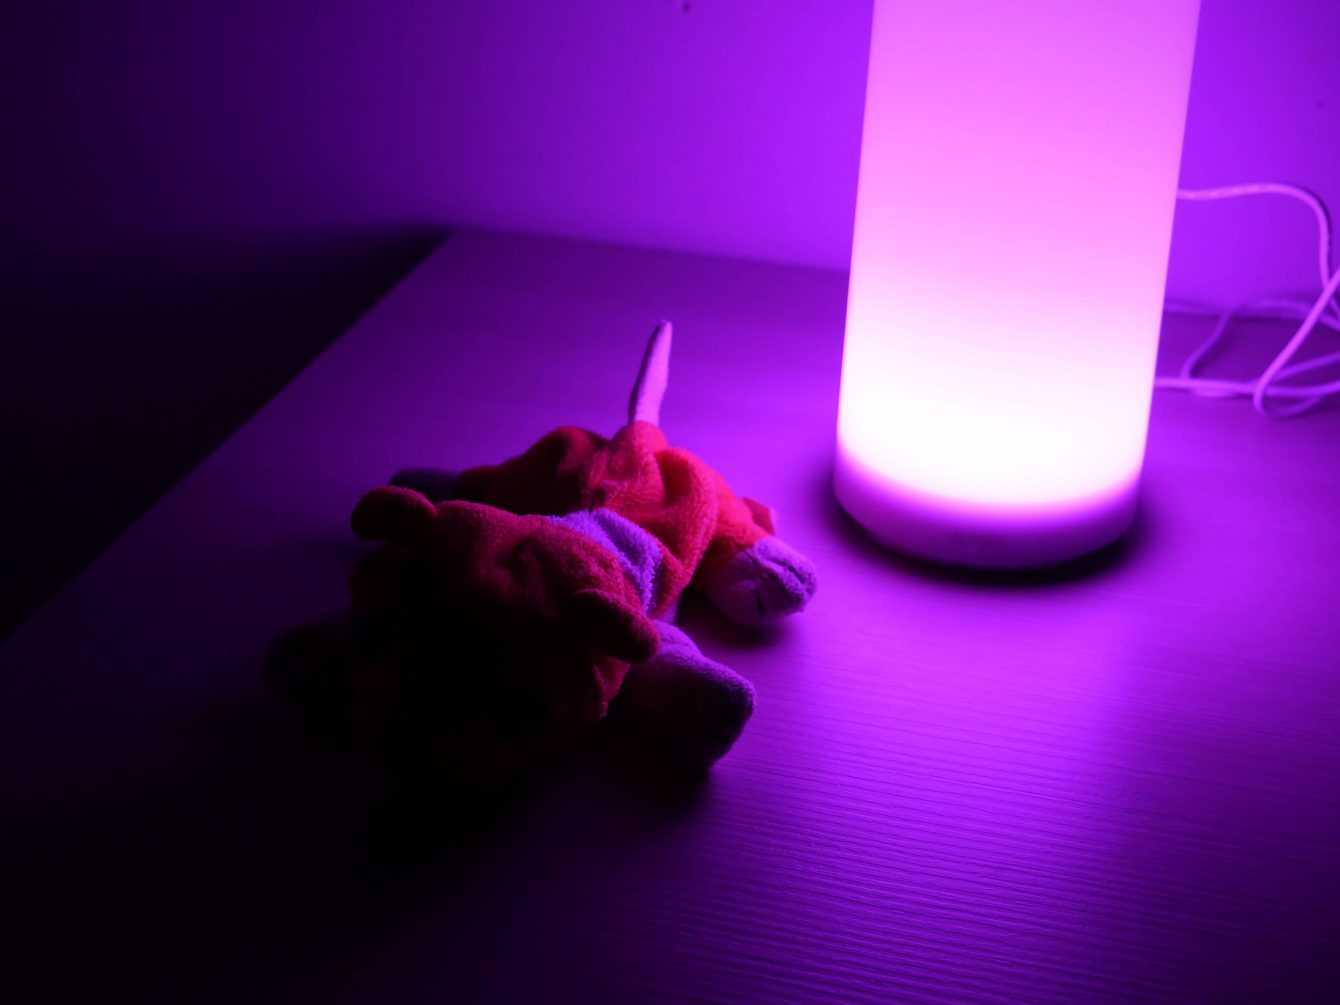 Recensione lampada AUKEY RGB LT-T7R